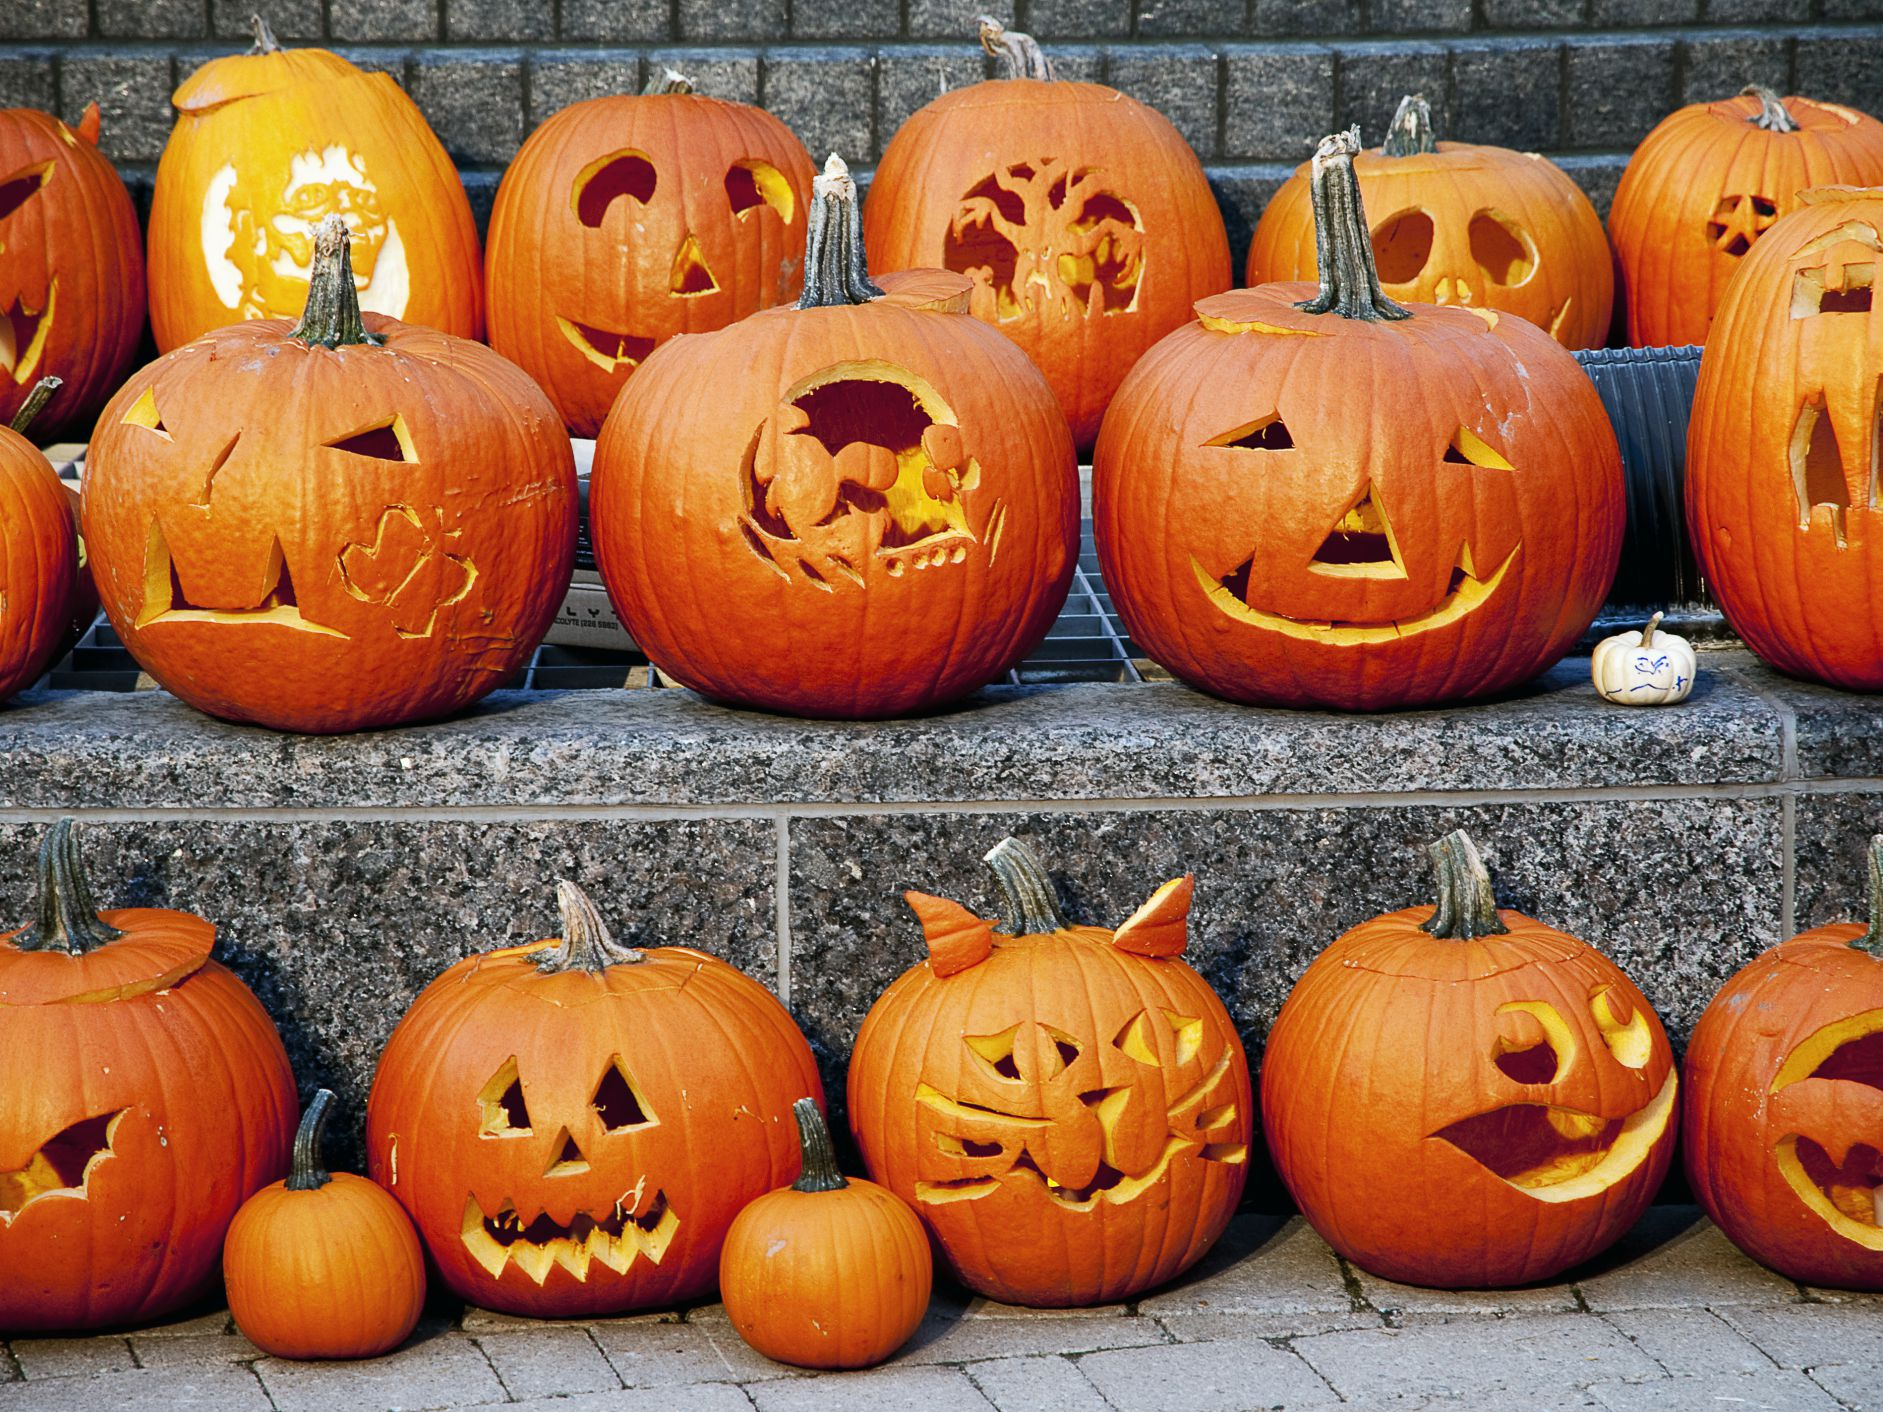 How To Preserve A Carved Halloween Jack O Lantern